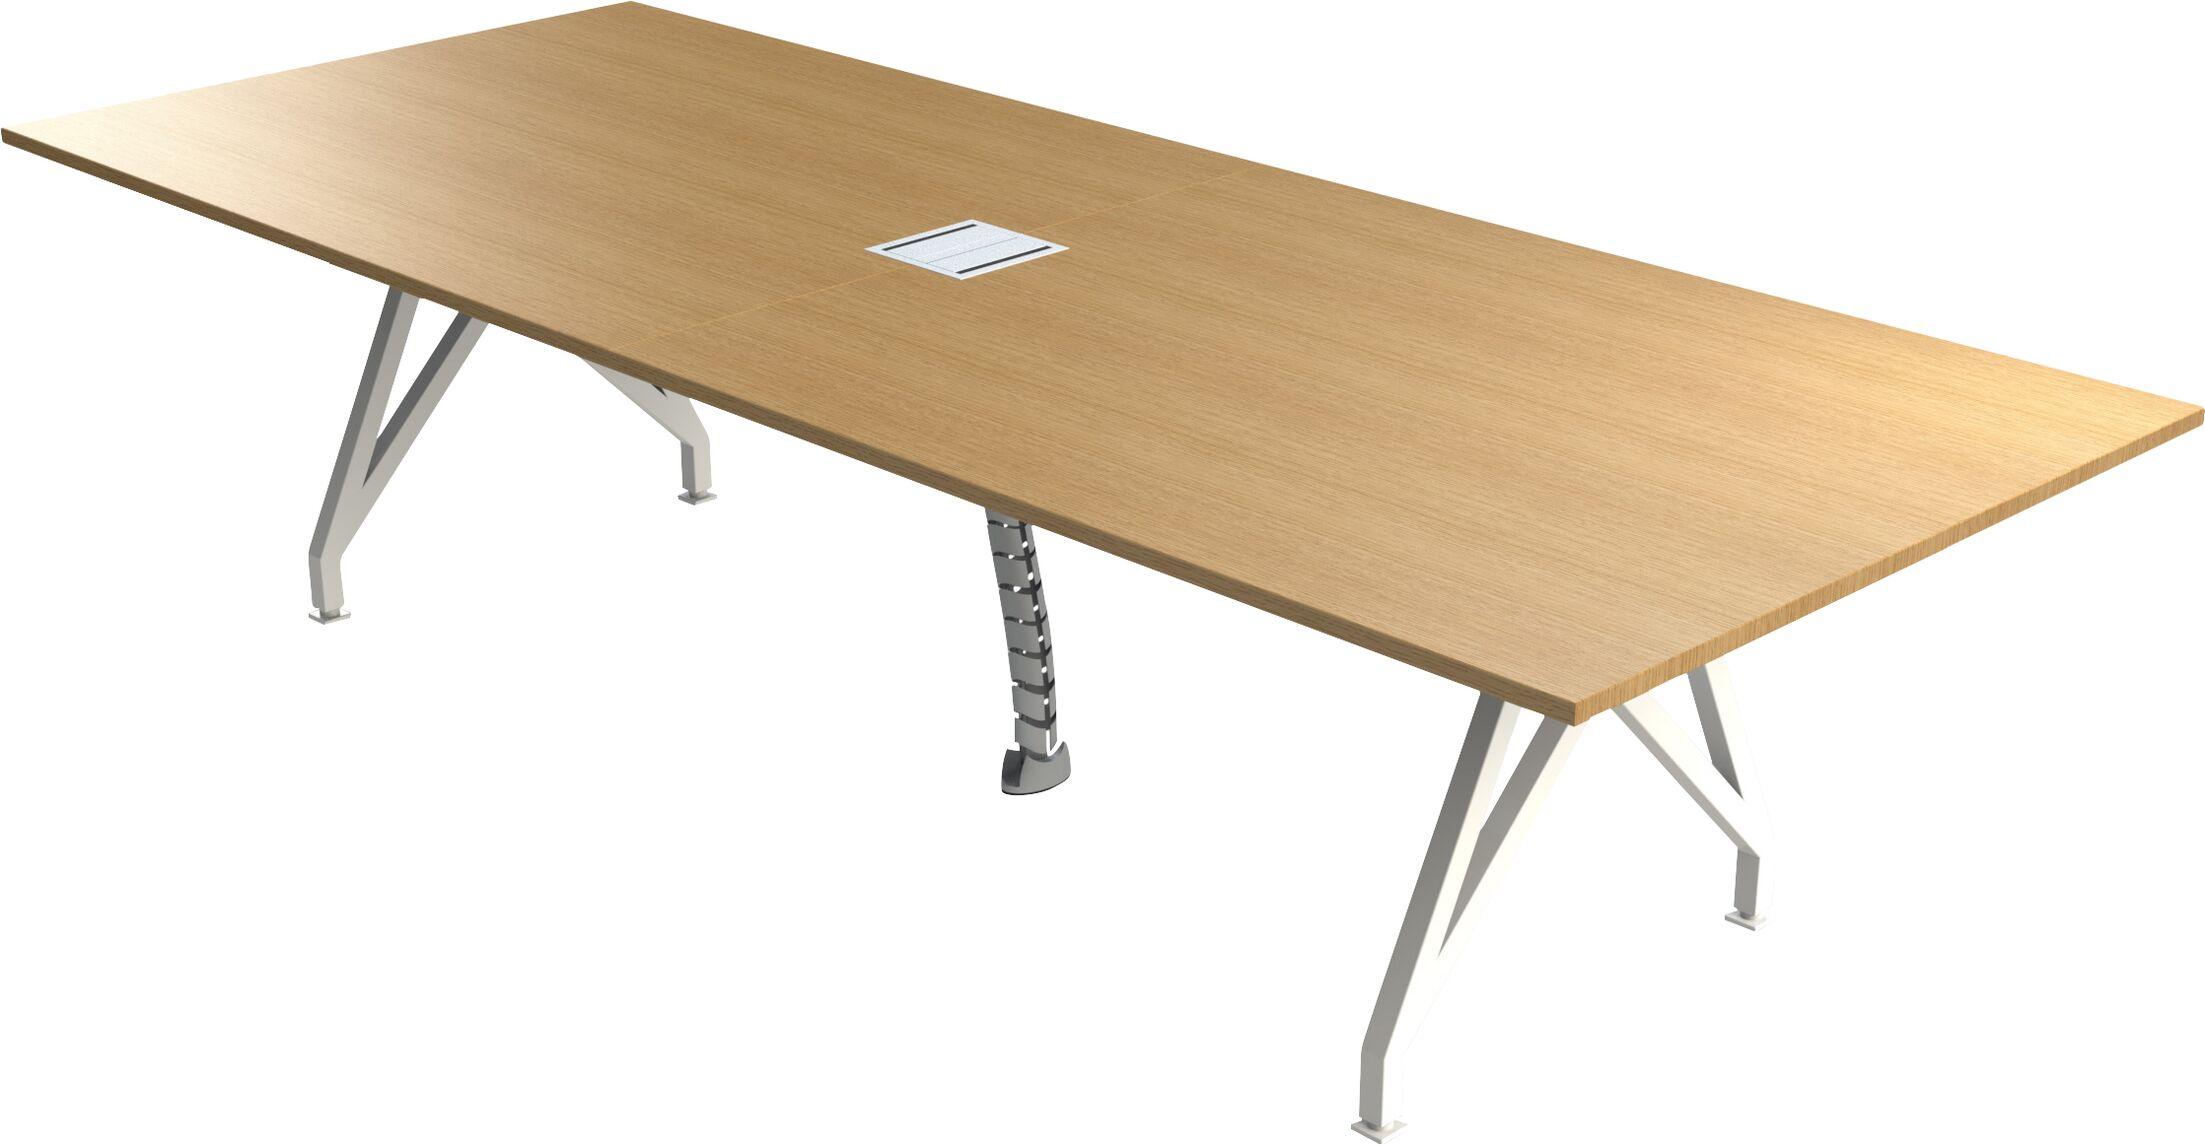 Think Tank Rectangular Conference Table Finish: Maple, Size: 29